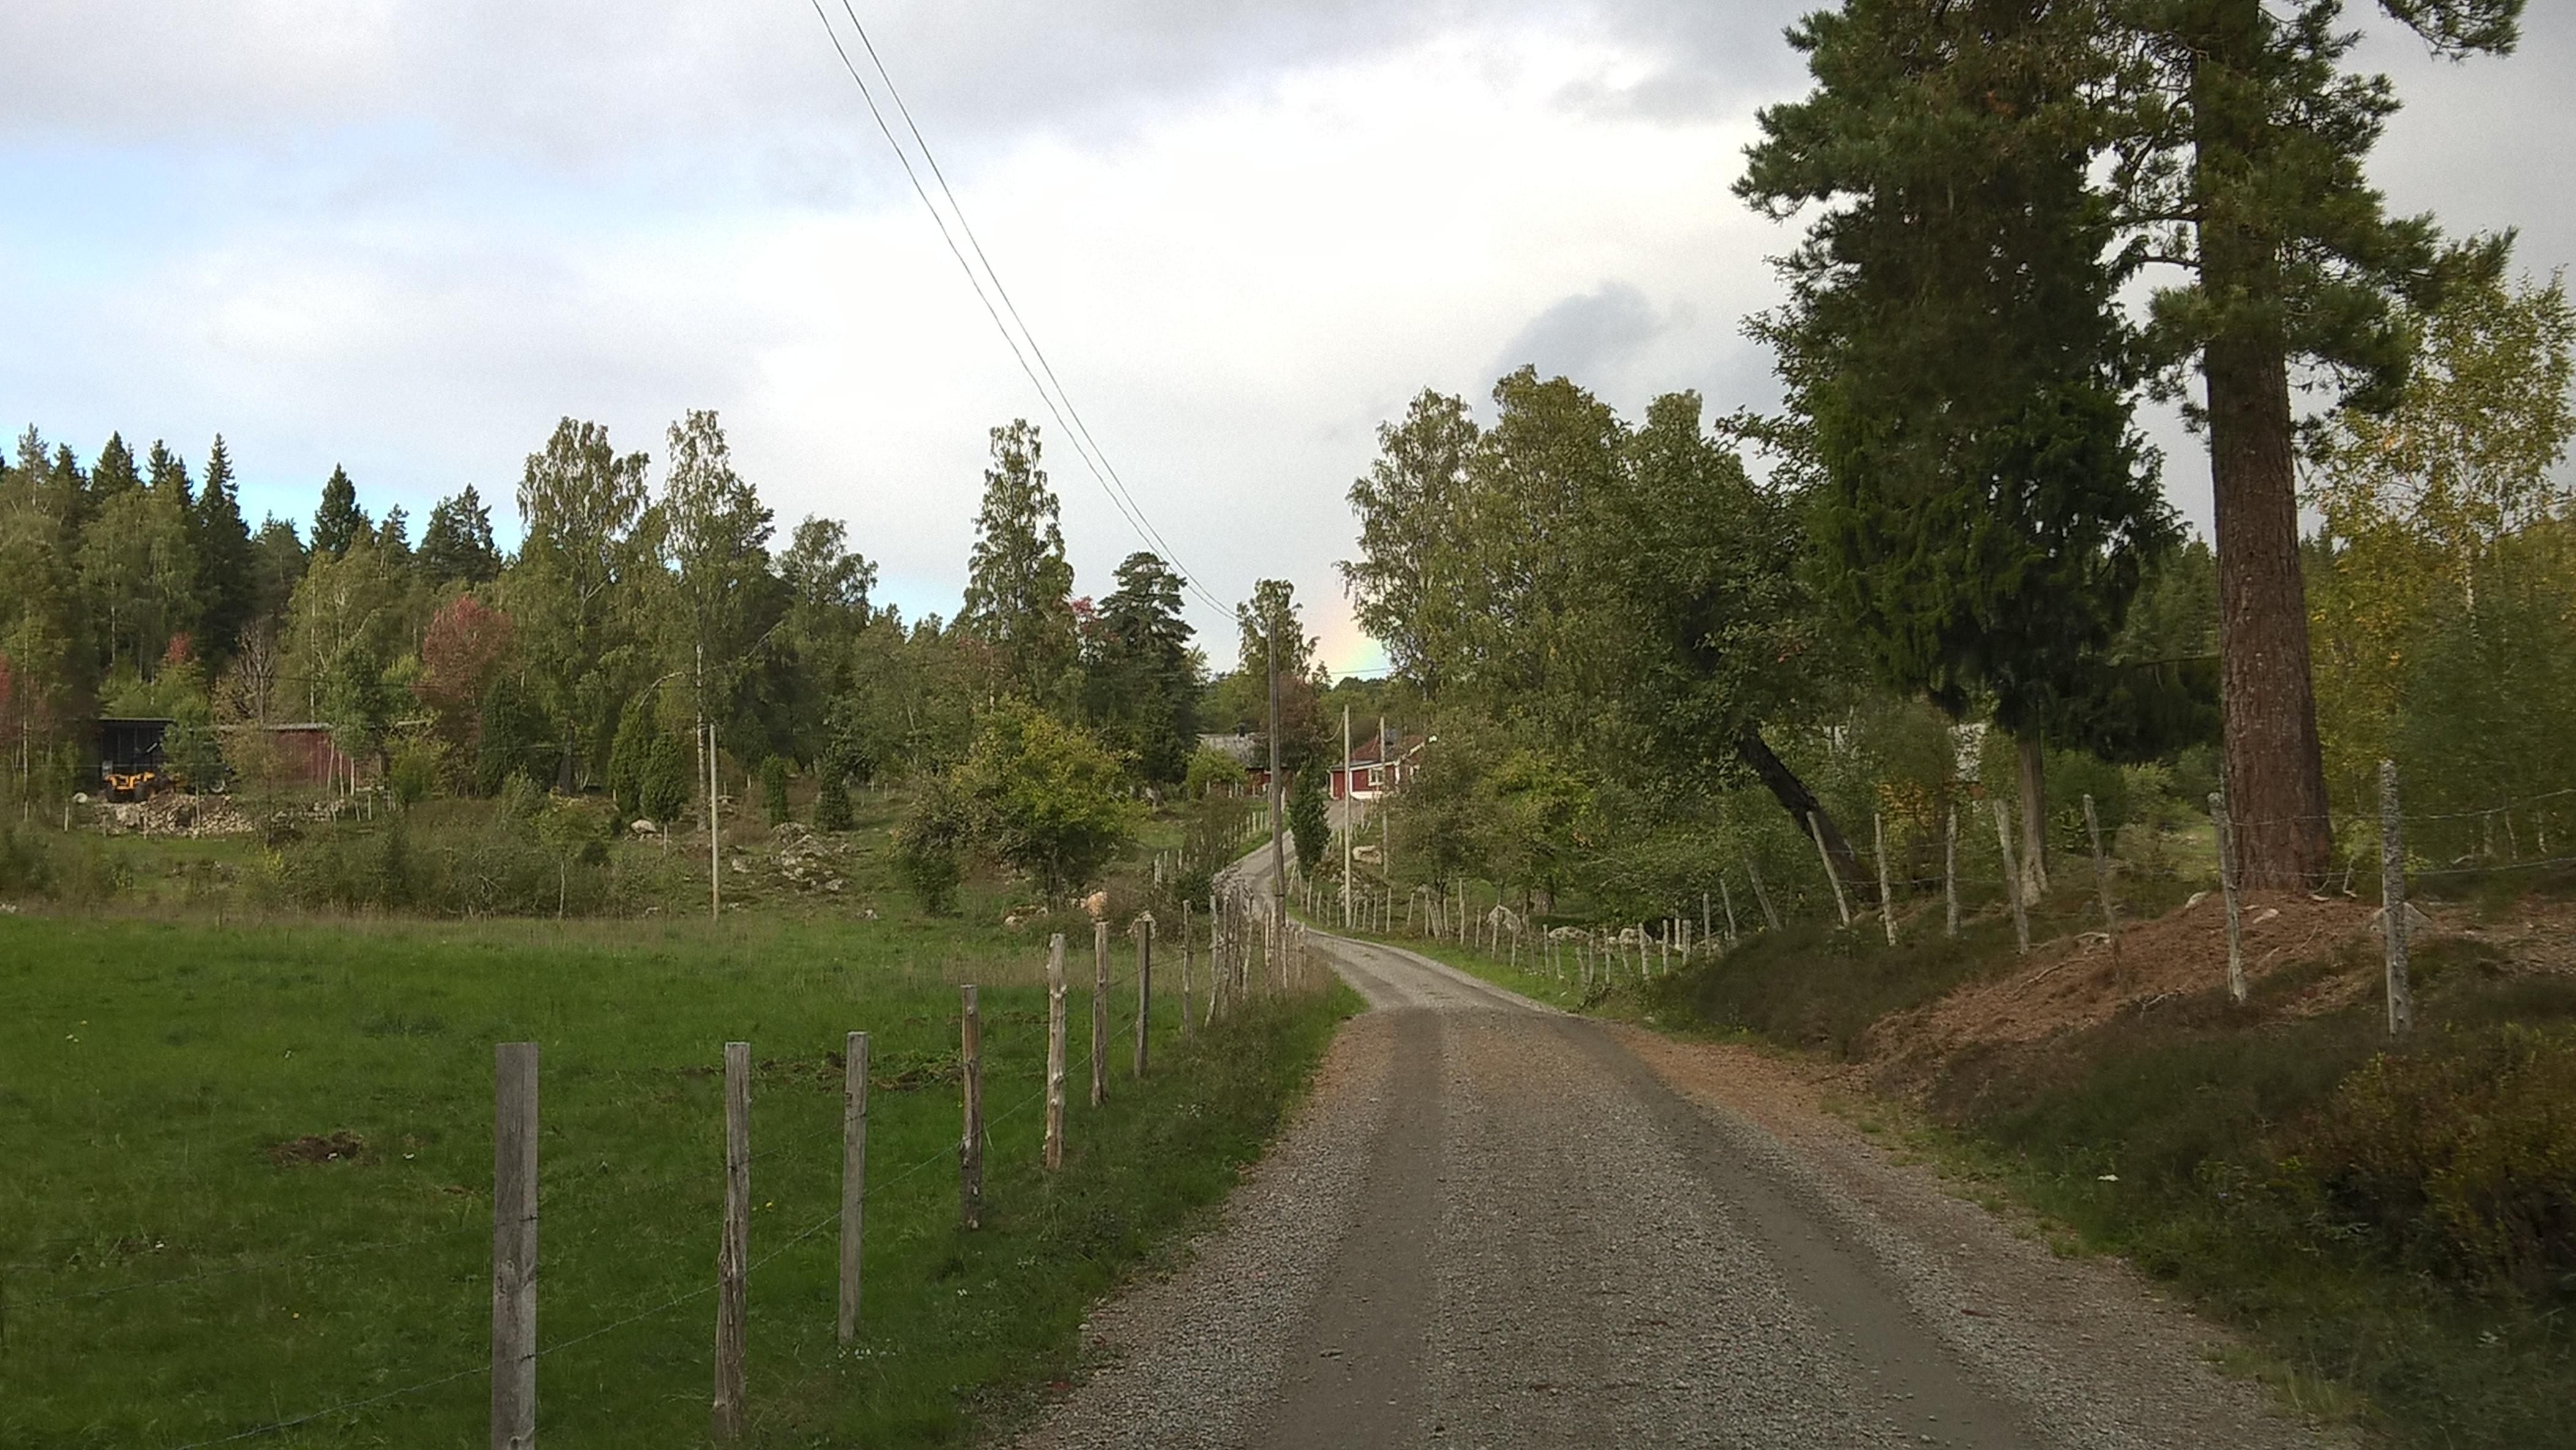 lagom_strasse_in_schweden